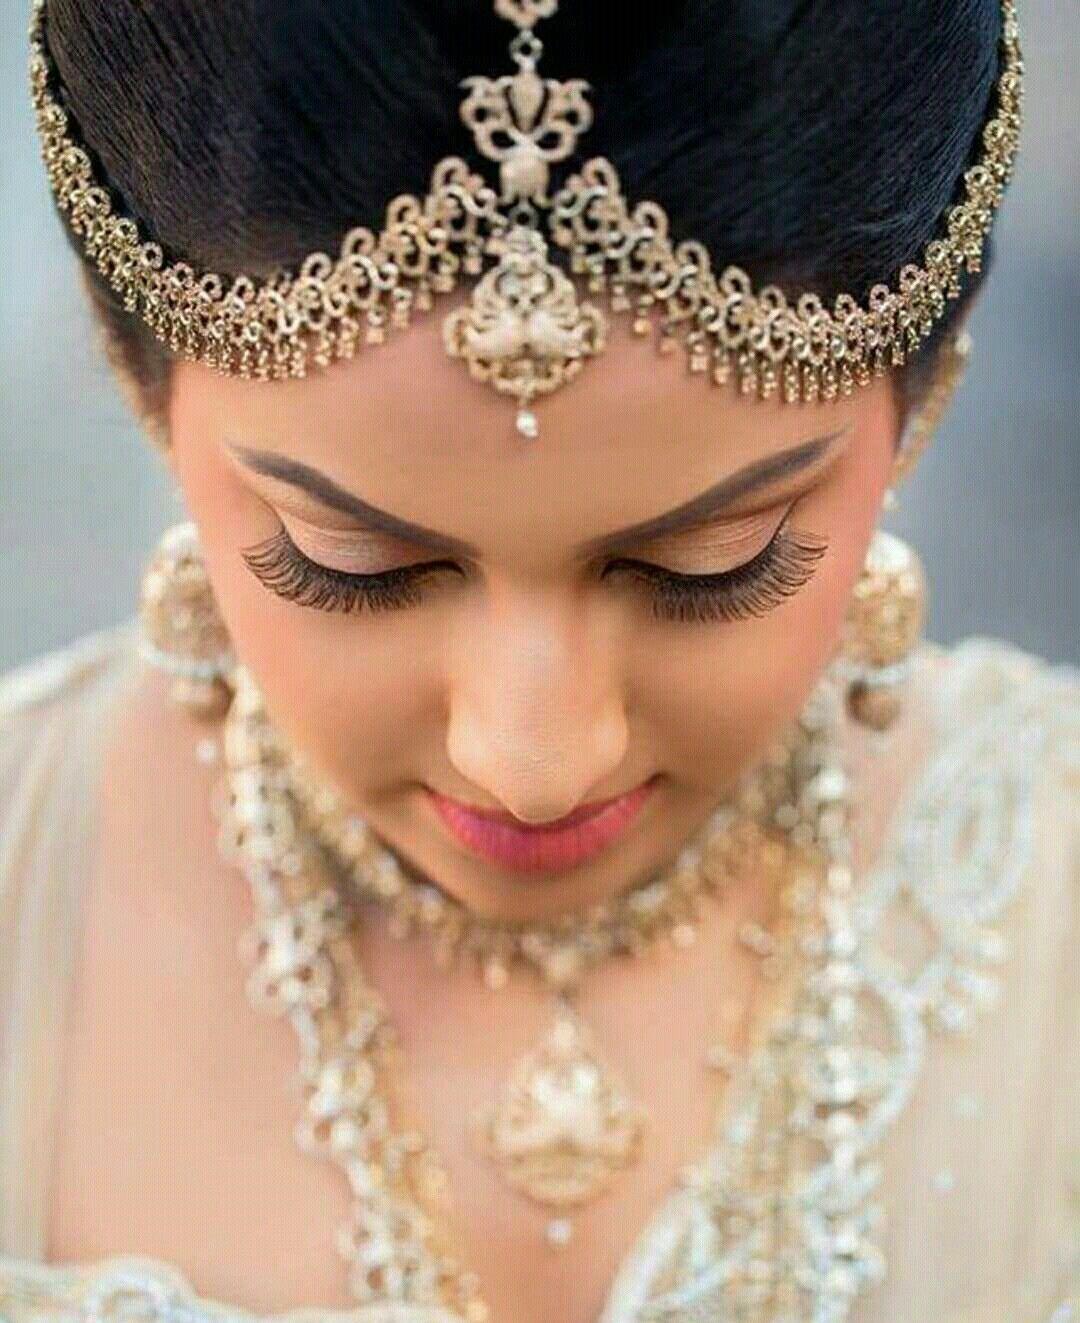 Wedding Hairstyle In Sri Lanka: Bridal Wear By Yashodara Rathnathilaka On Kandyan Brides